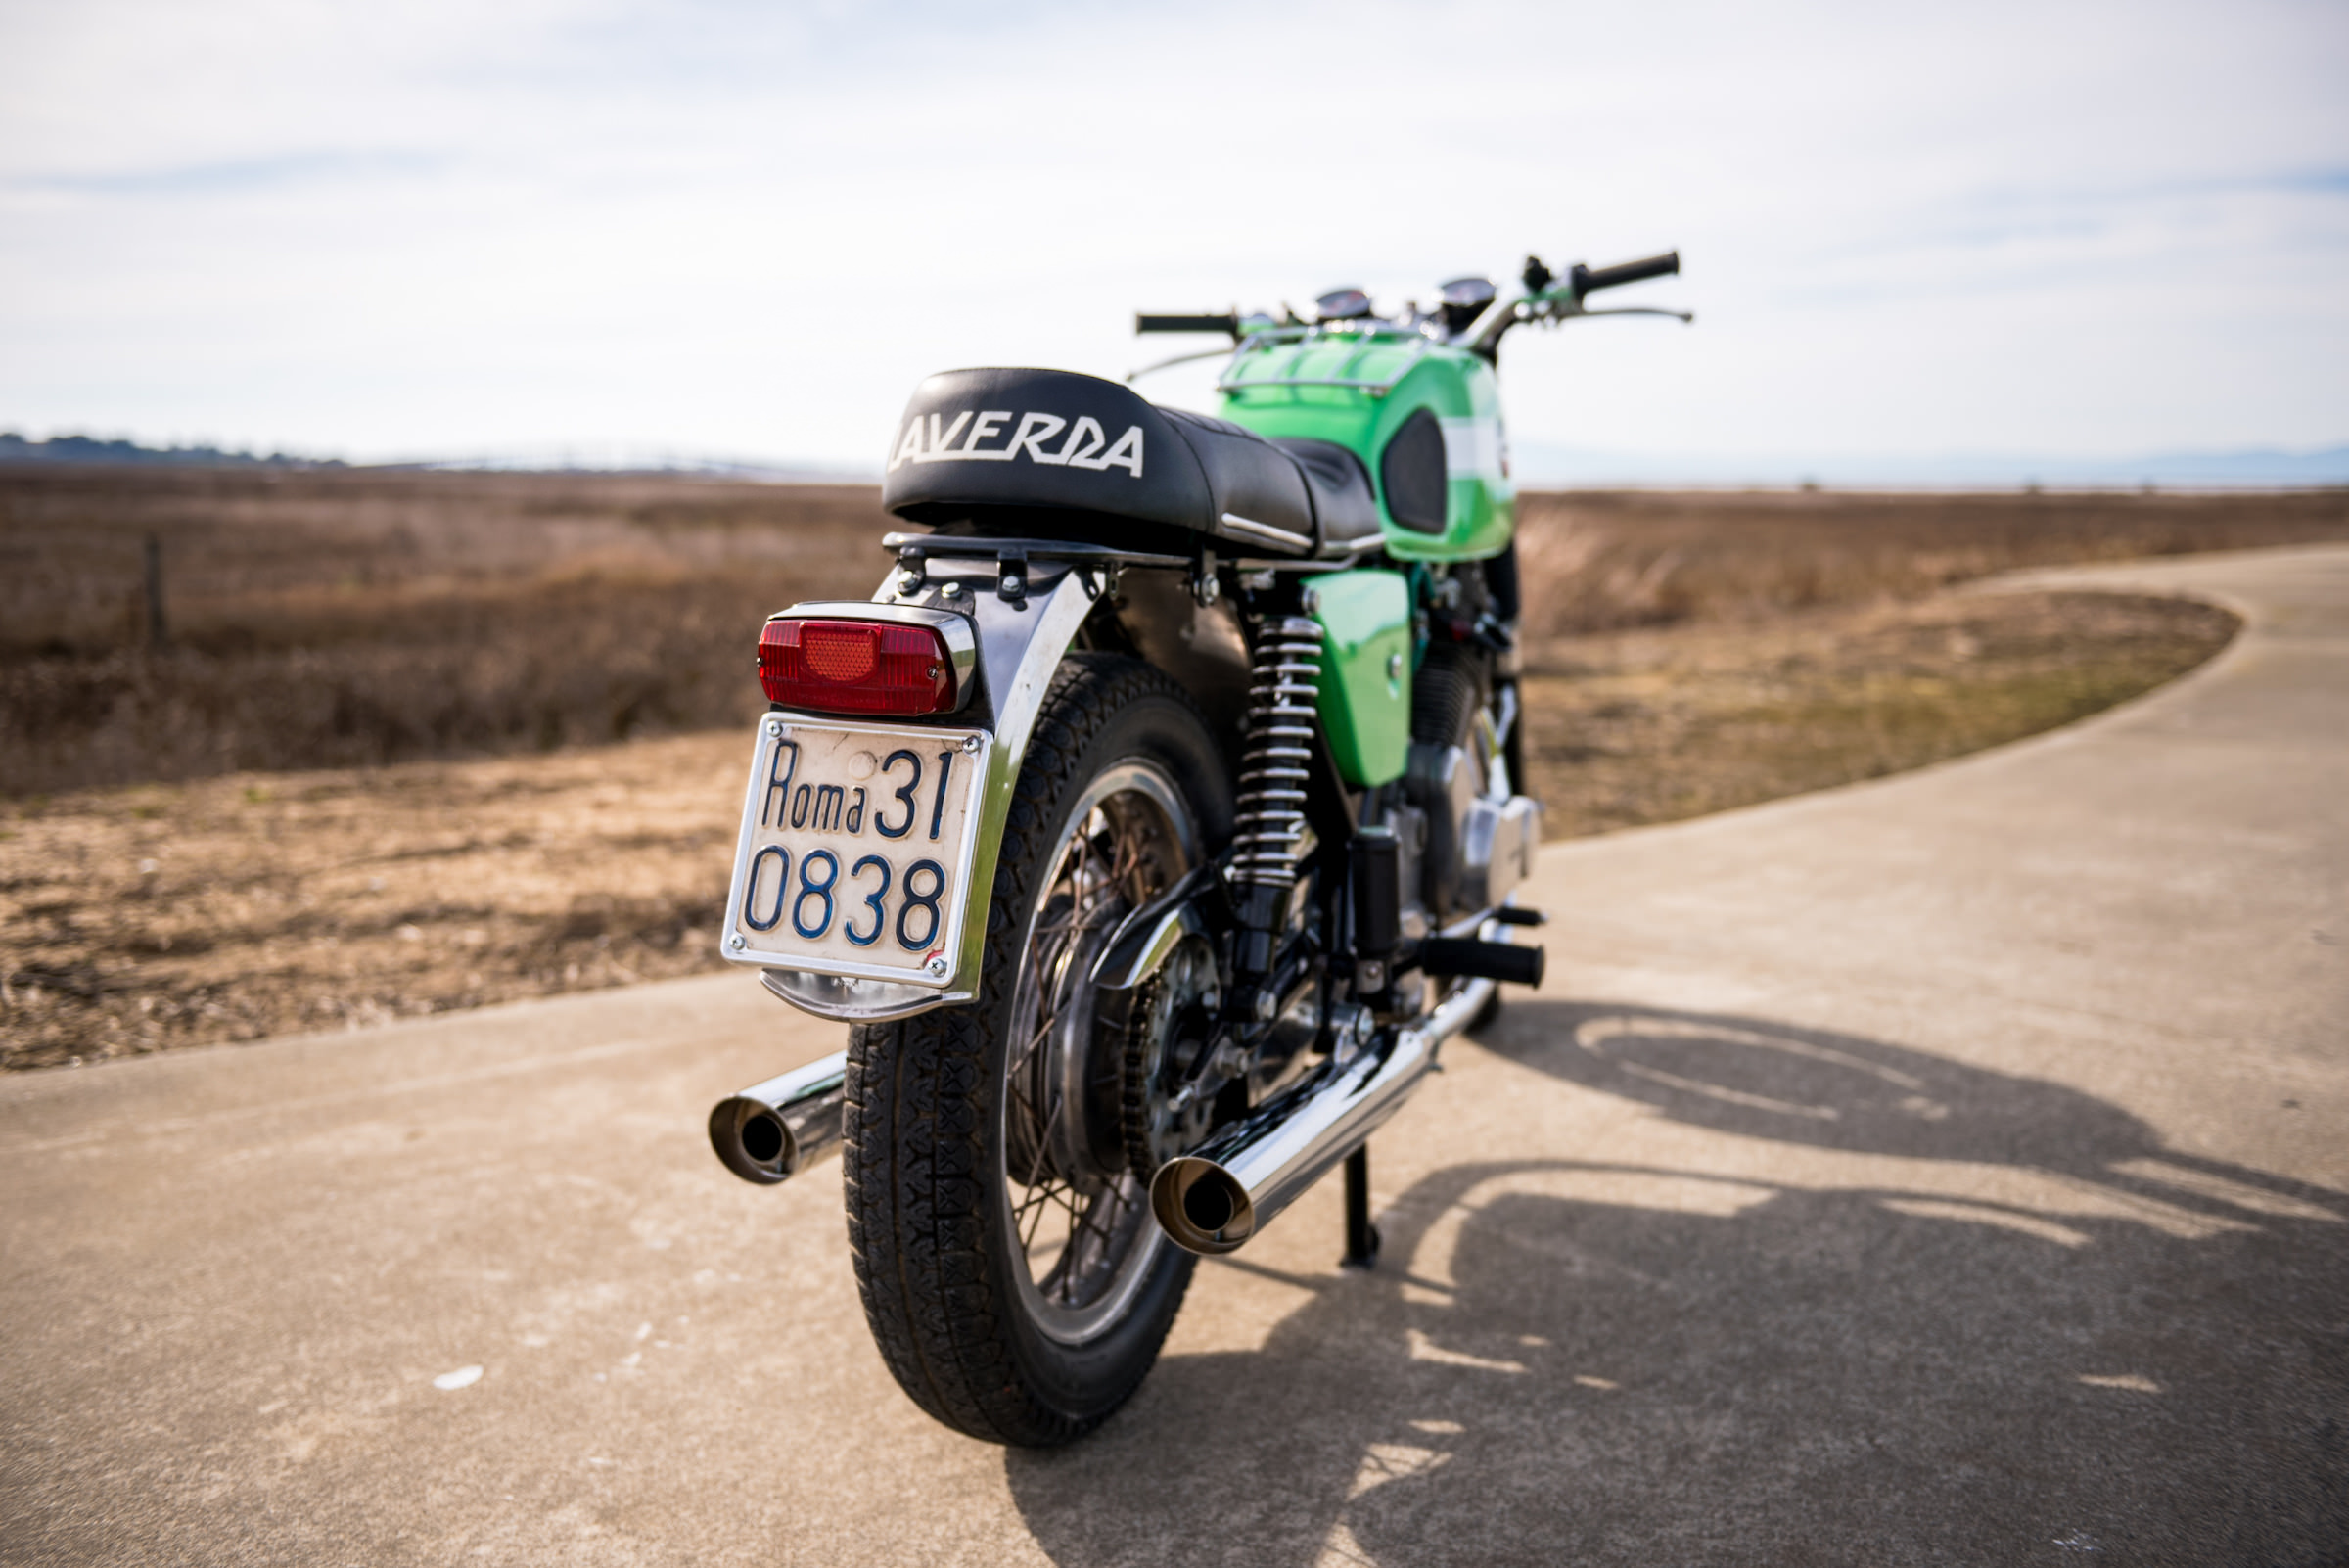 1970 Laverda Gt 750 The Big Italian Parallel Twin Honda 75cc Motorcycle